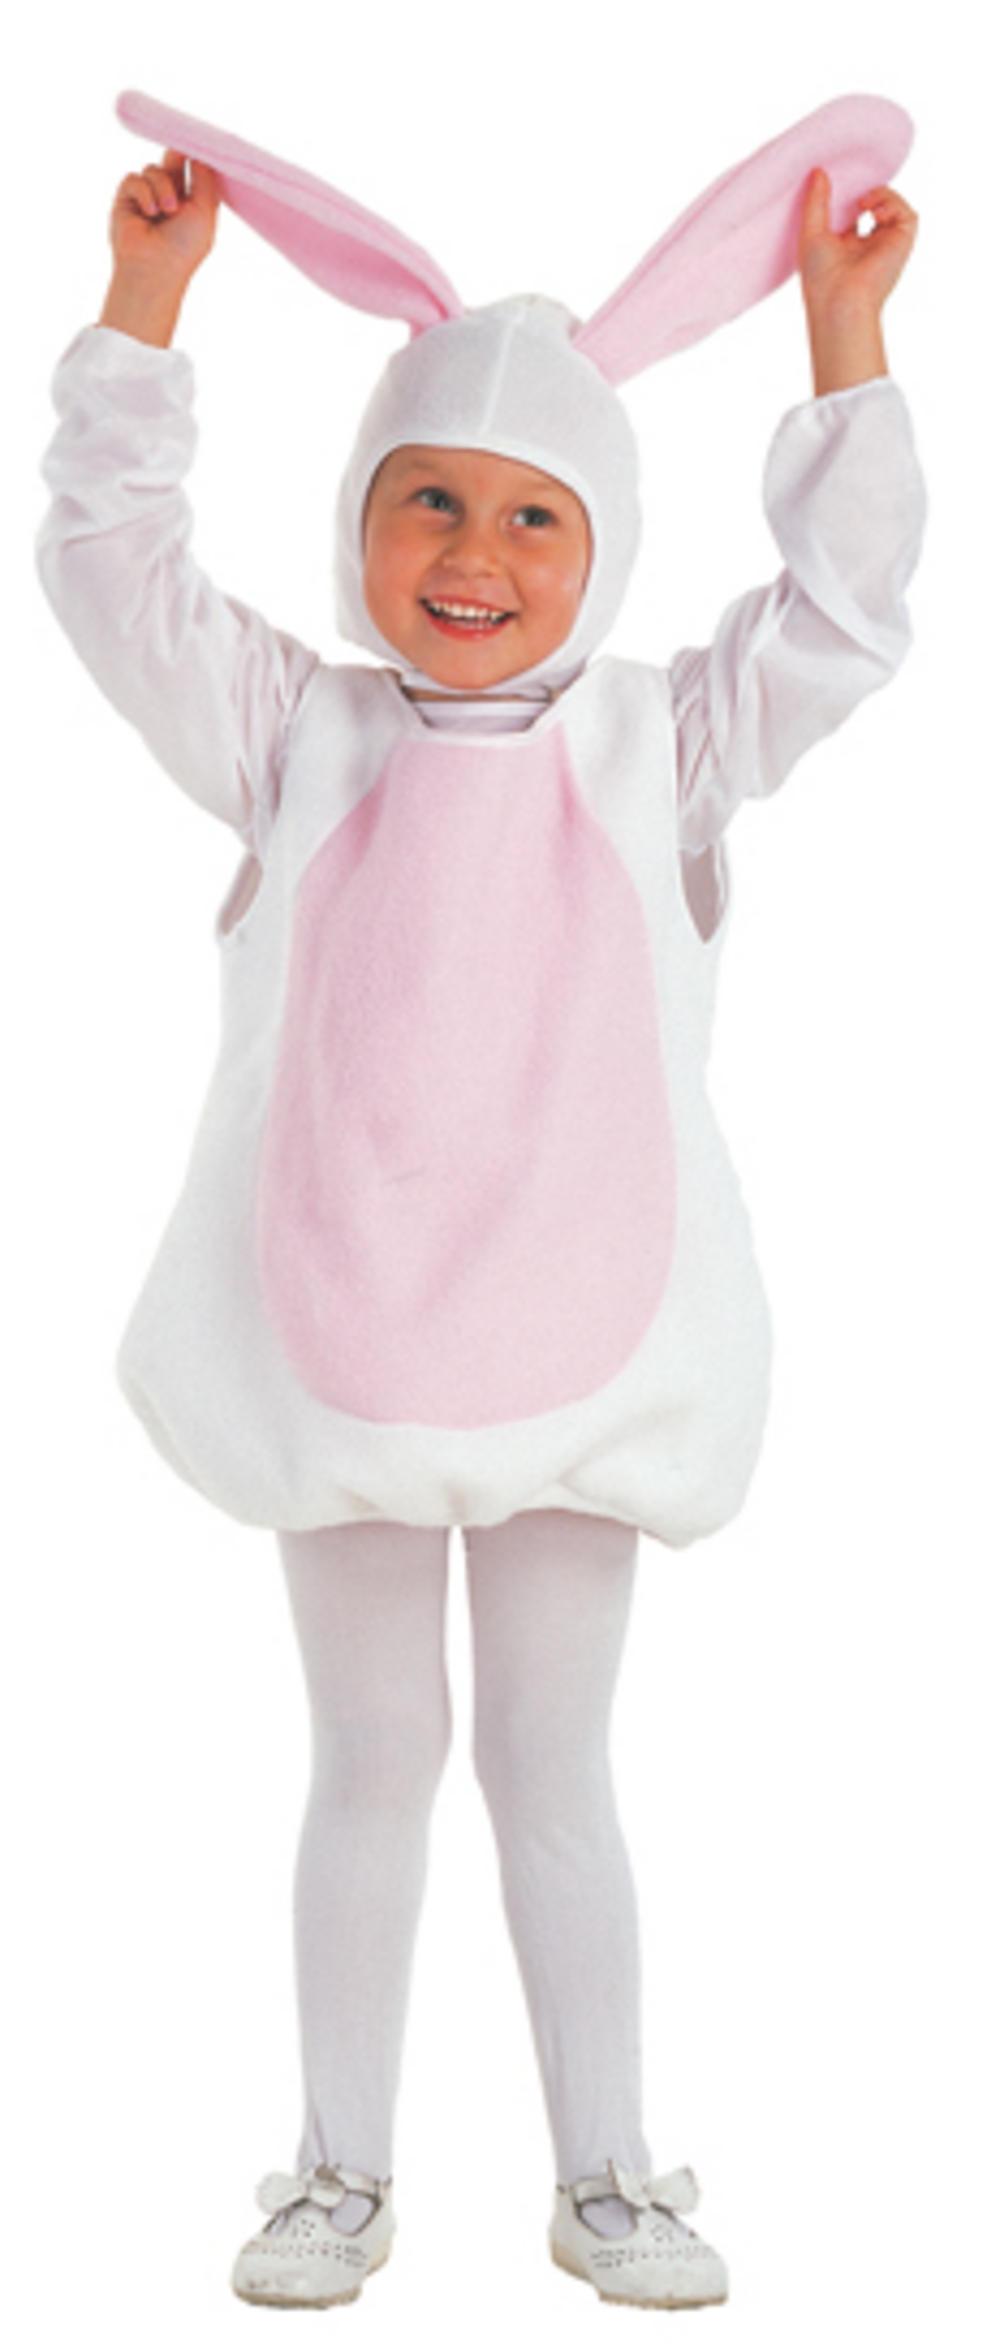 Cute Rabbit Easter Costume